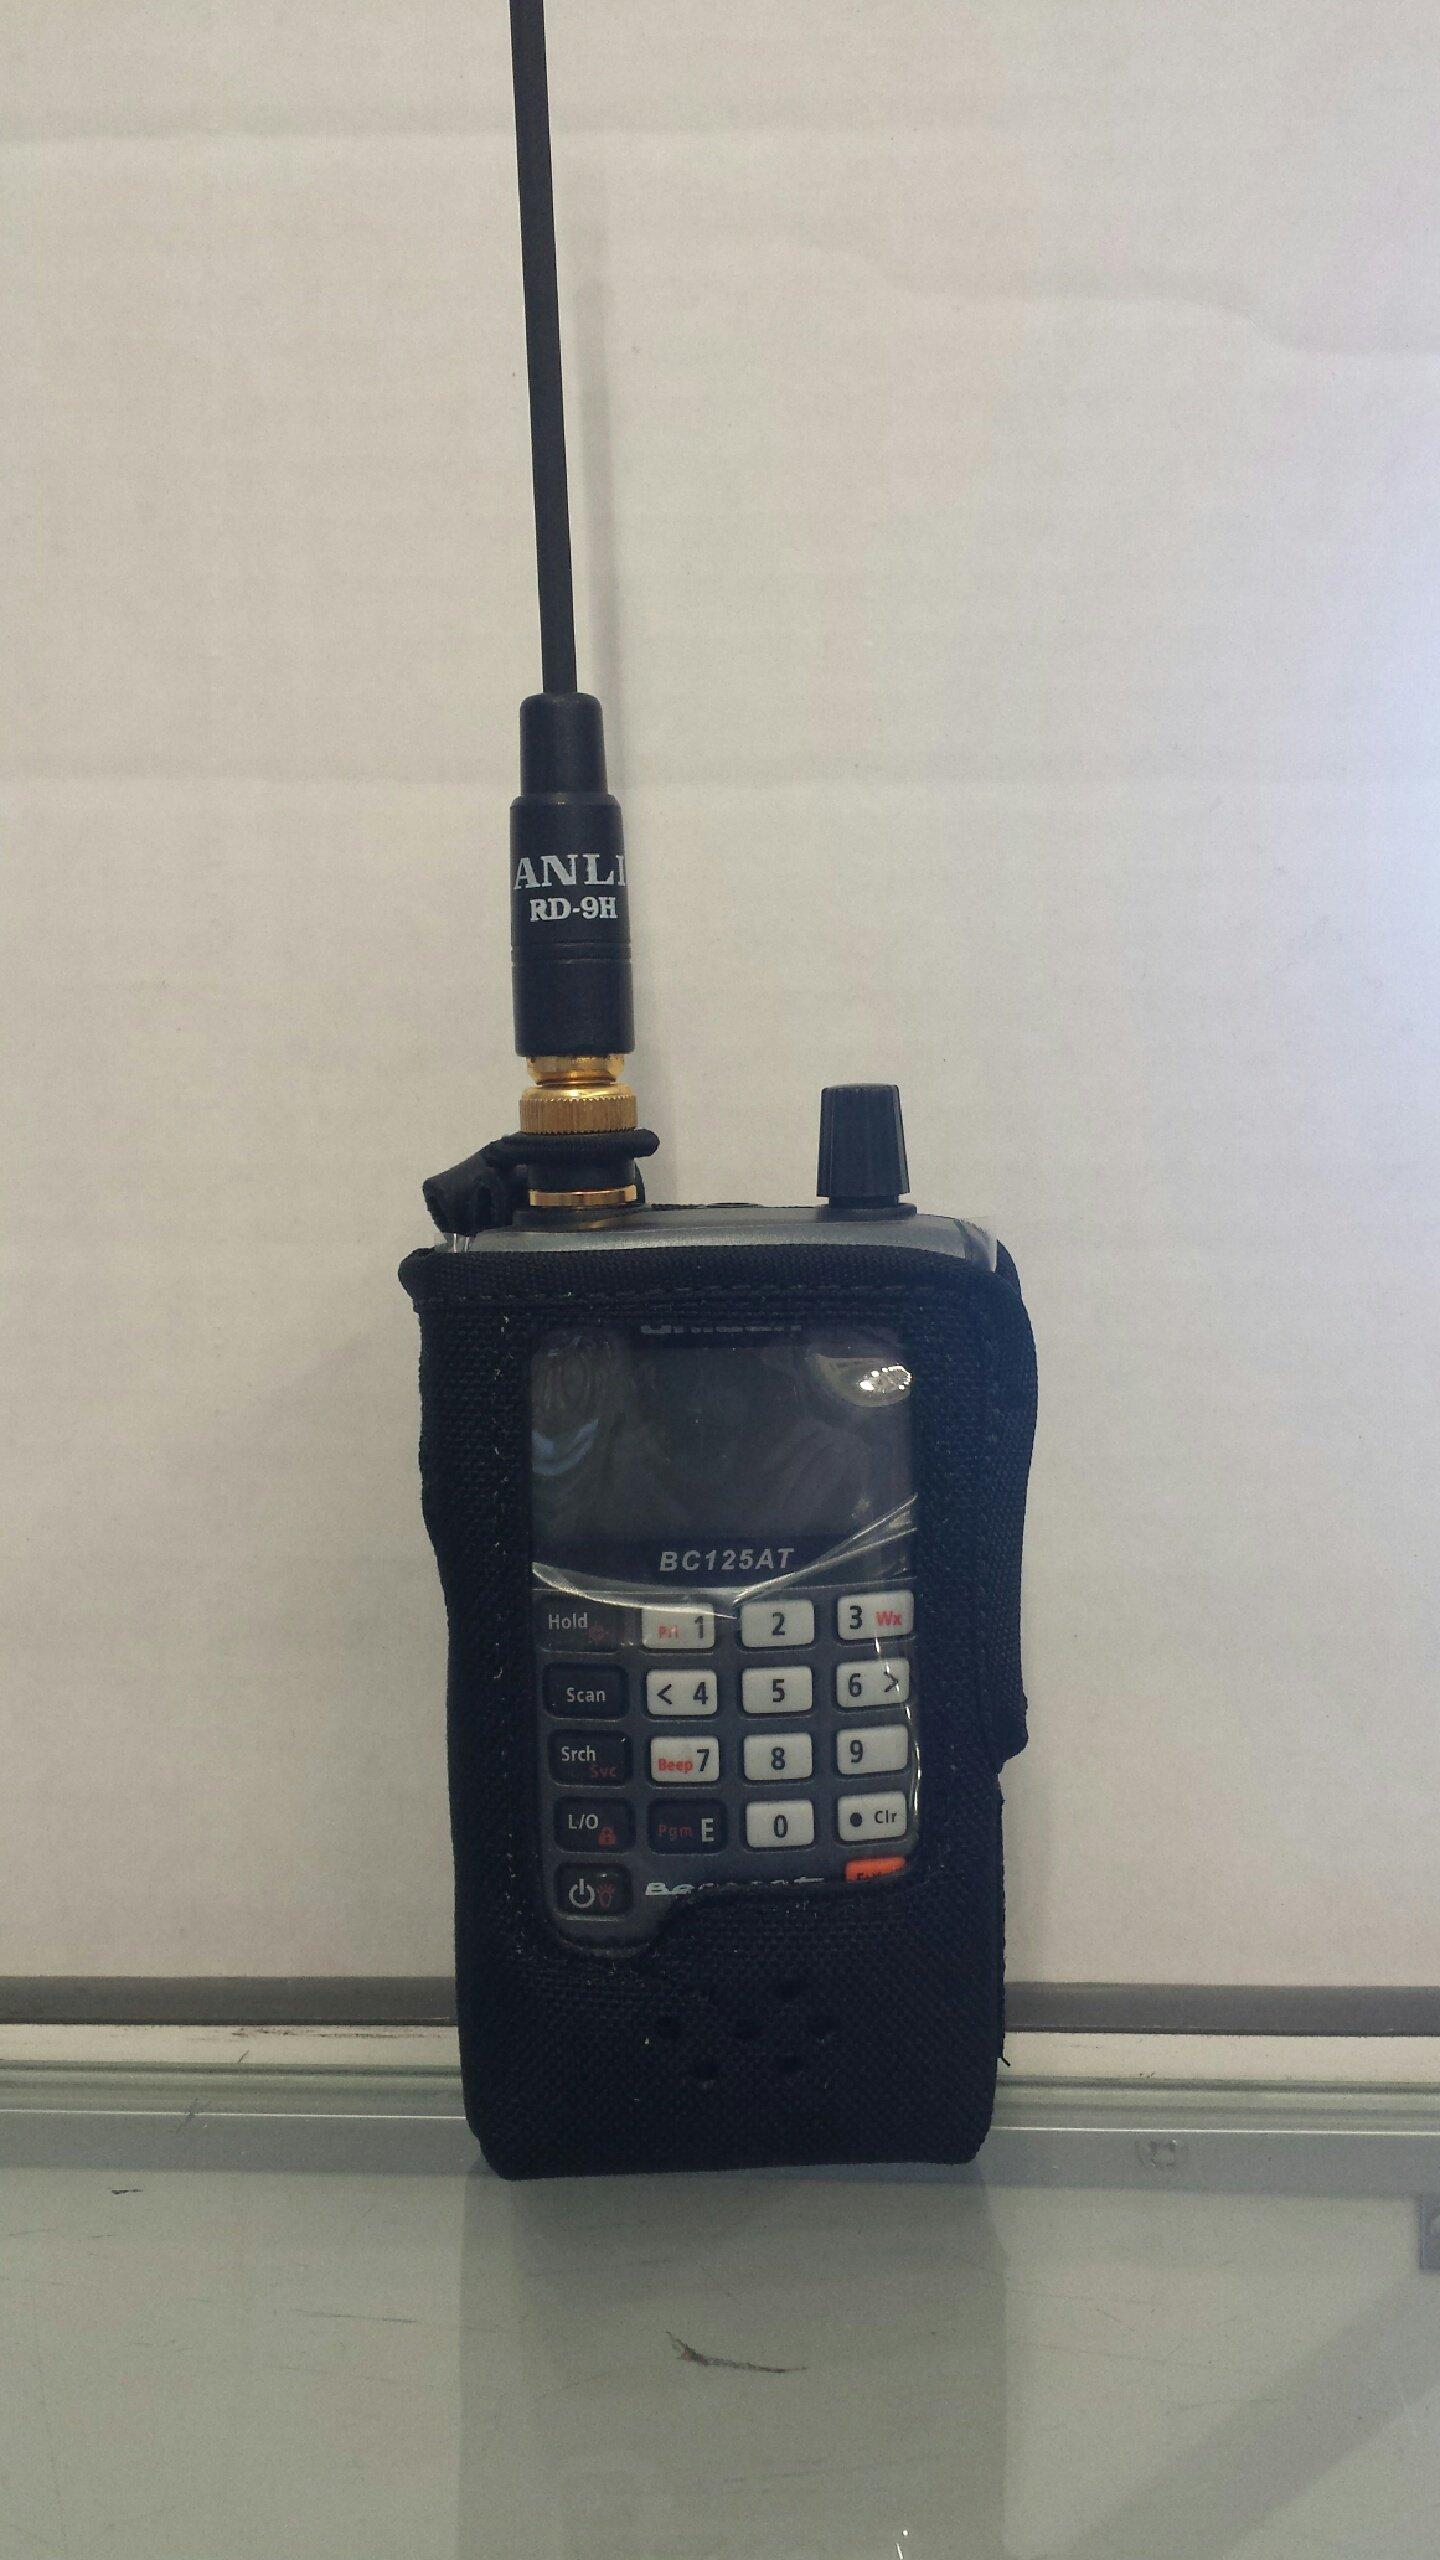 Custom Nylon Scanner Case For UNIDEN BCD325P2, BC-125AT, BC-95XLT, BC75XLT, SC-230 Radio Scanner by Case